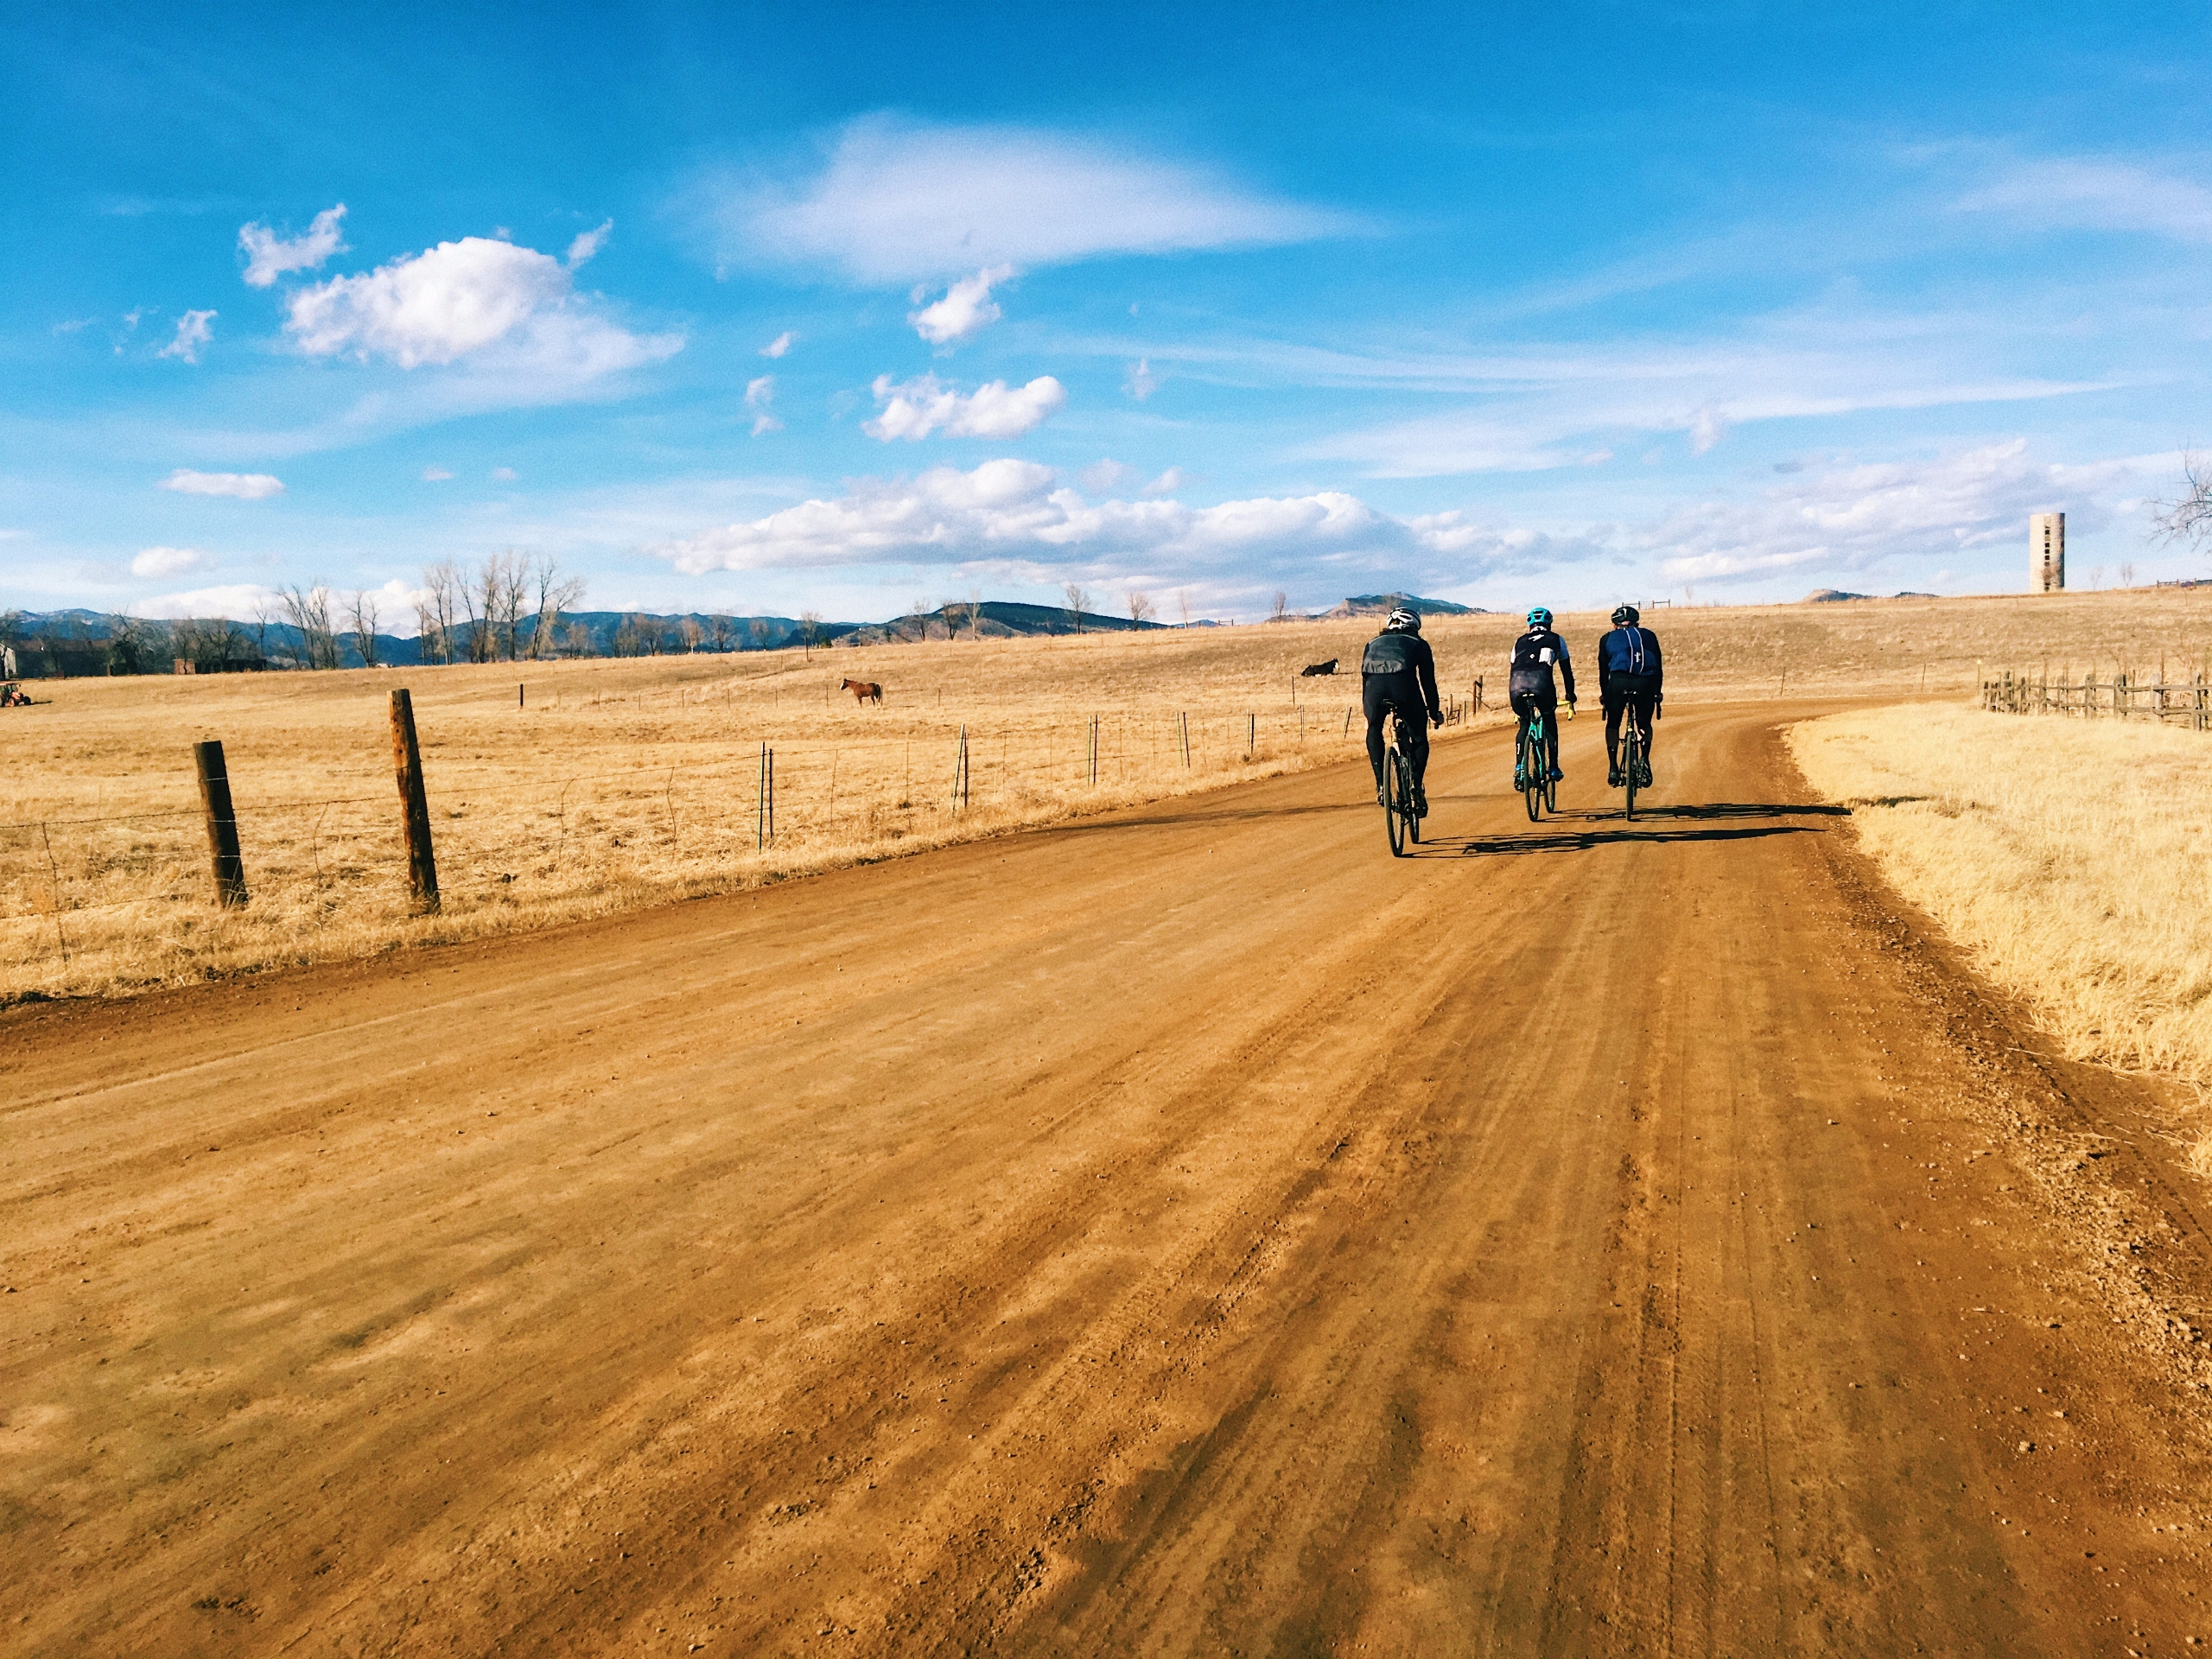 Rural Boulder, Colorado Februar - jjjjustin | ello